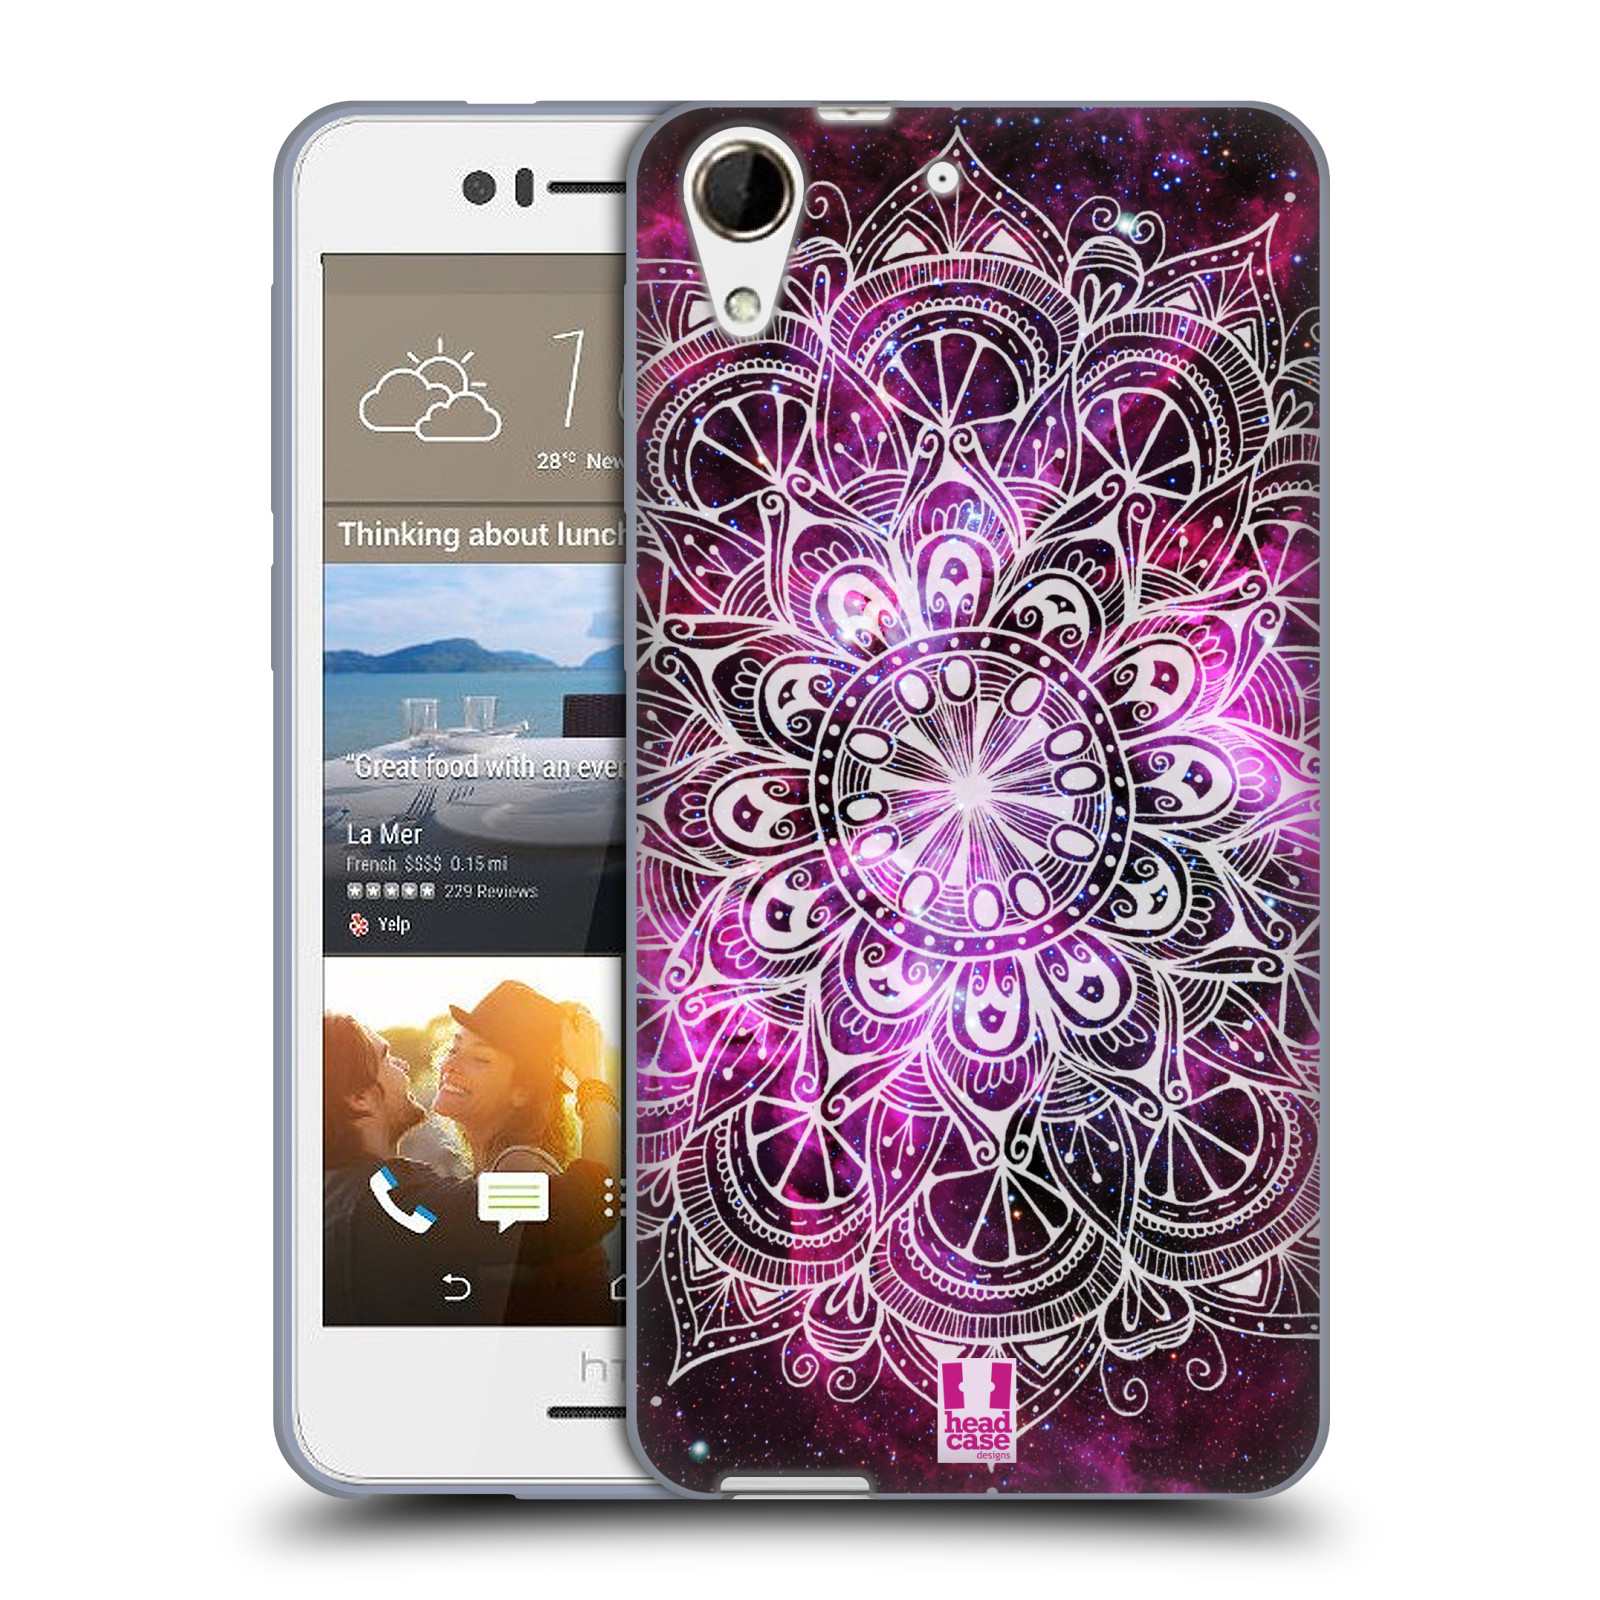 Silikonové pouzdro na mobil HTC Desire 728G Dual SIM HEAD CASE Mandala Doodle Nebula (Silikonový kryt či obal na mobilní telefon HTC Desire 728 G Dual SIM)